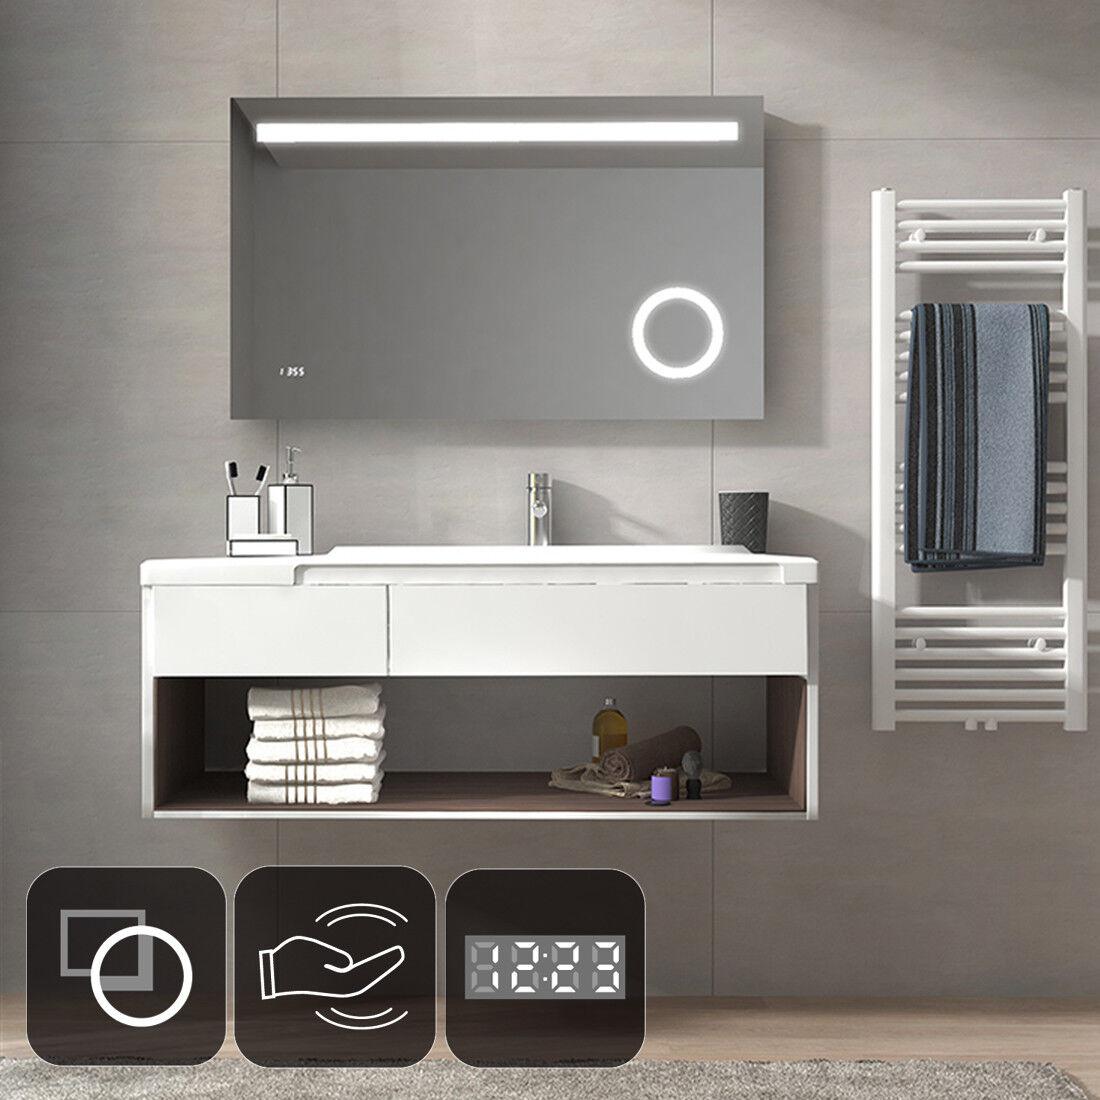 LED Beleuchtung Badspiegel Wandspiegel mit Sensor SCHALTER UHR Schminkspiegel